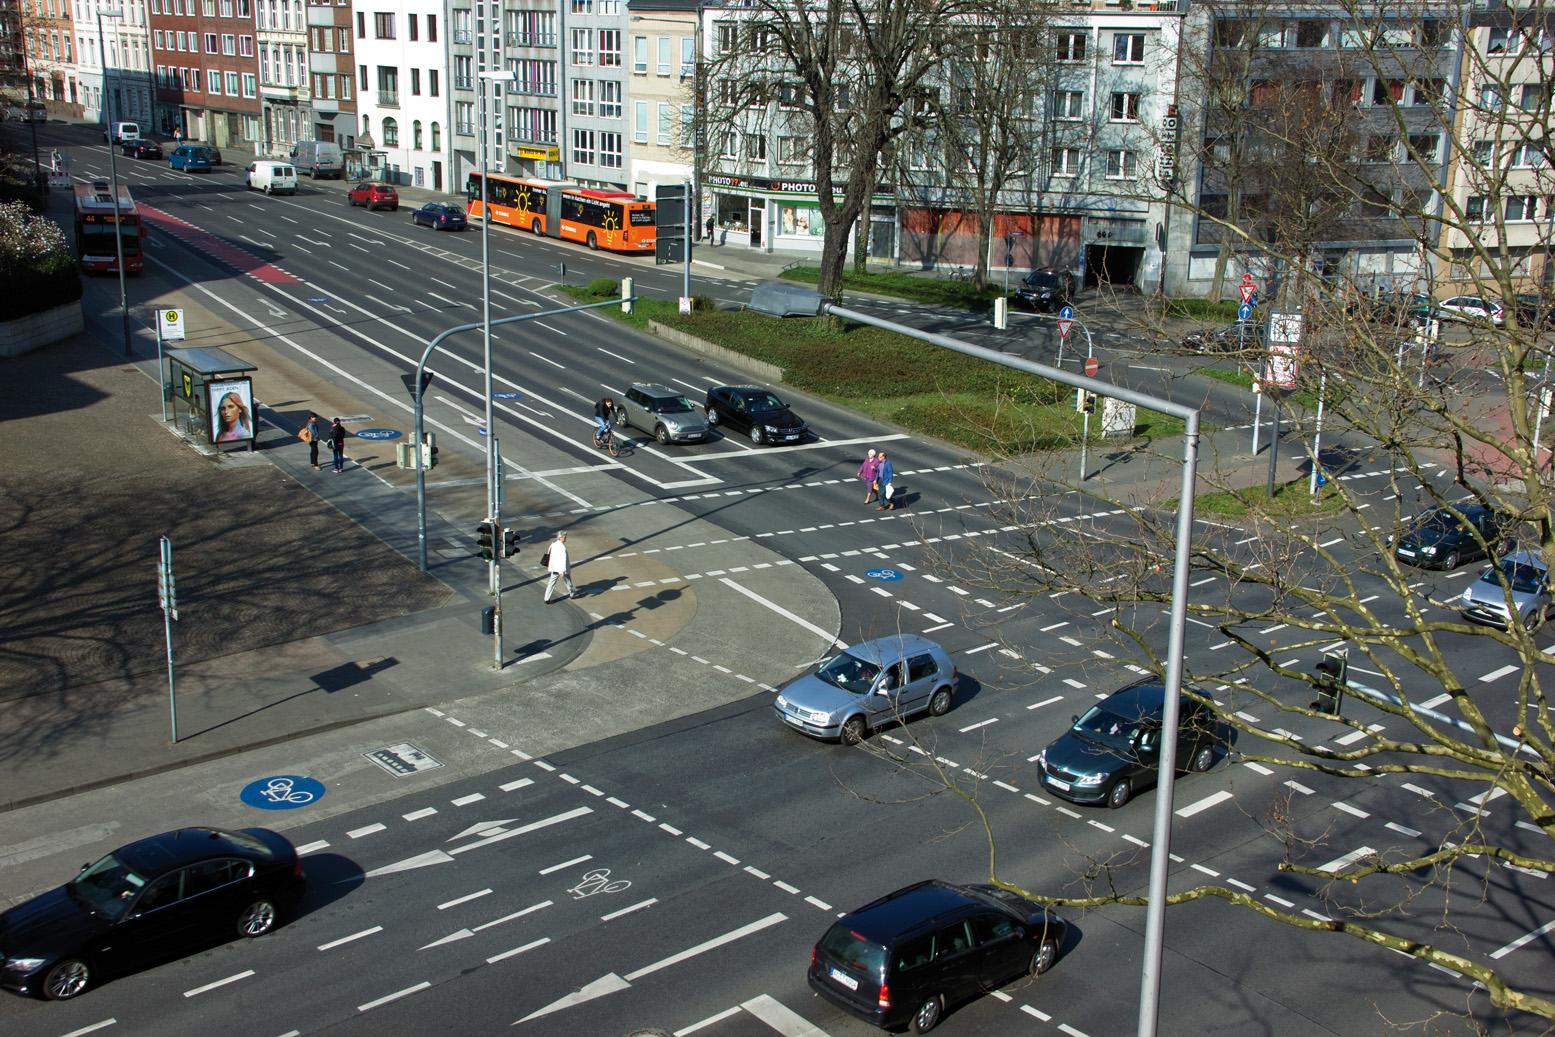 Single frauen aachen Single frauen aus aachen – Sie sucht Ihn Aachen Frau sucht Mann Single-Frauen kennenlernen